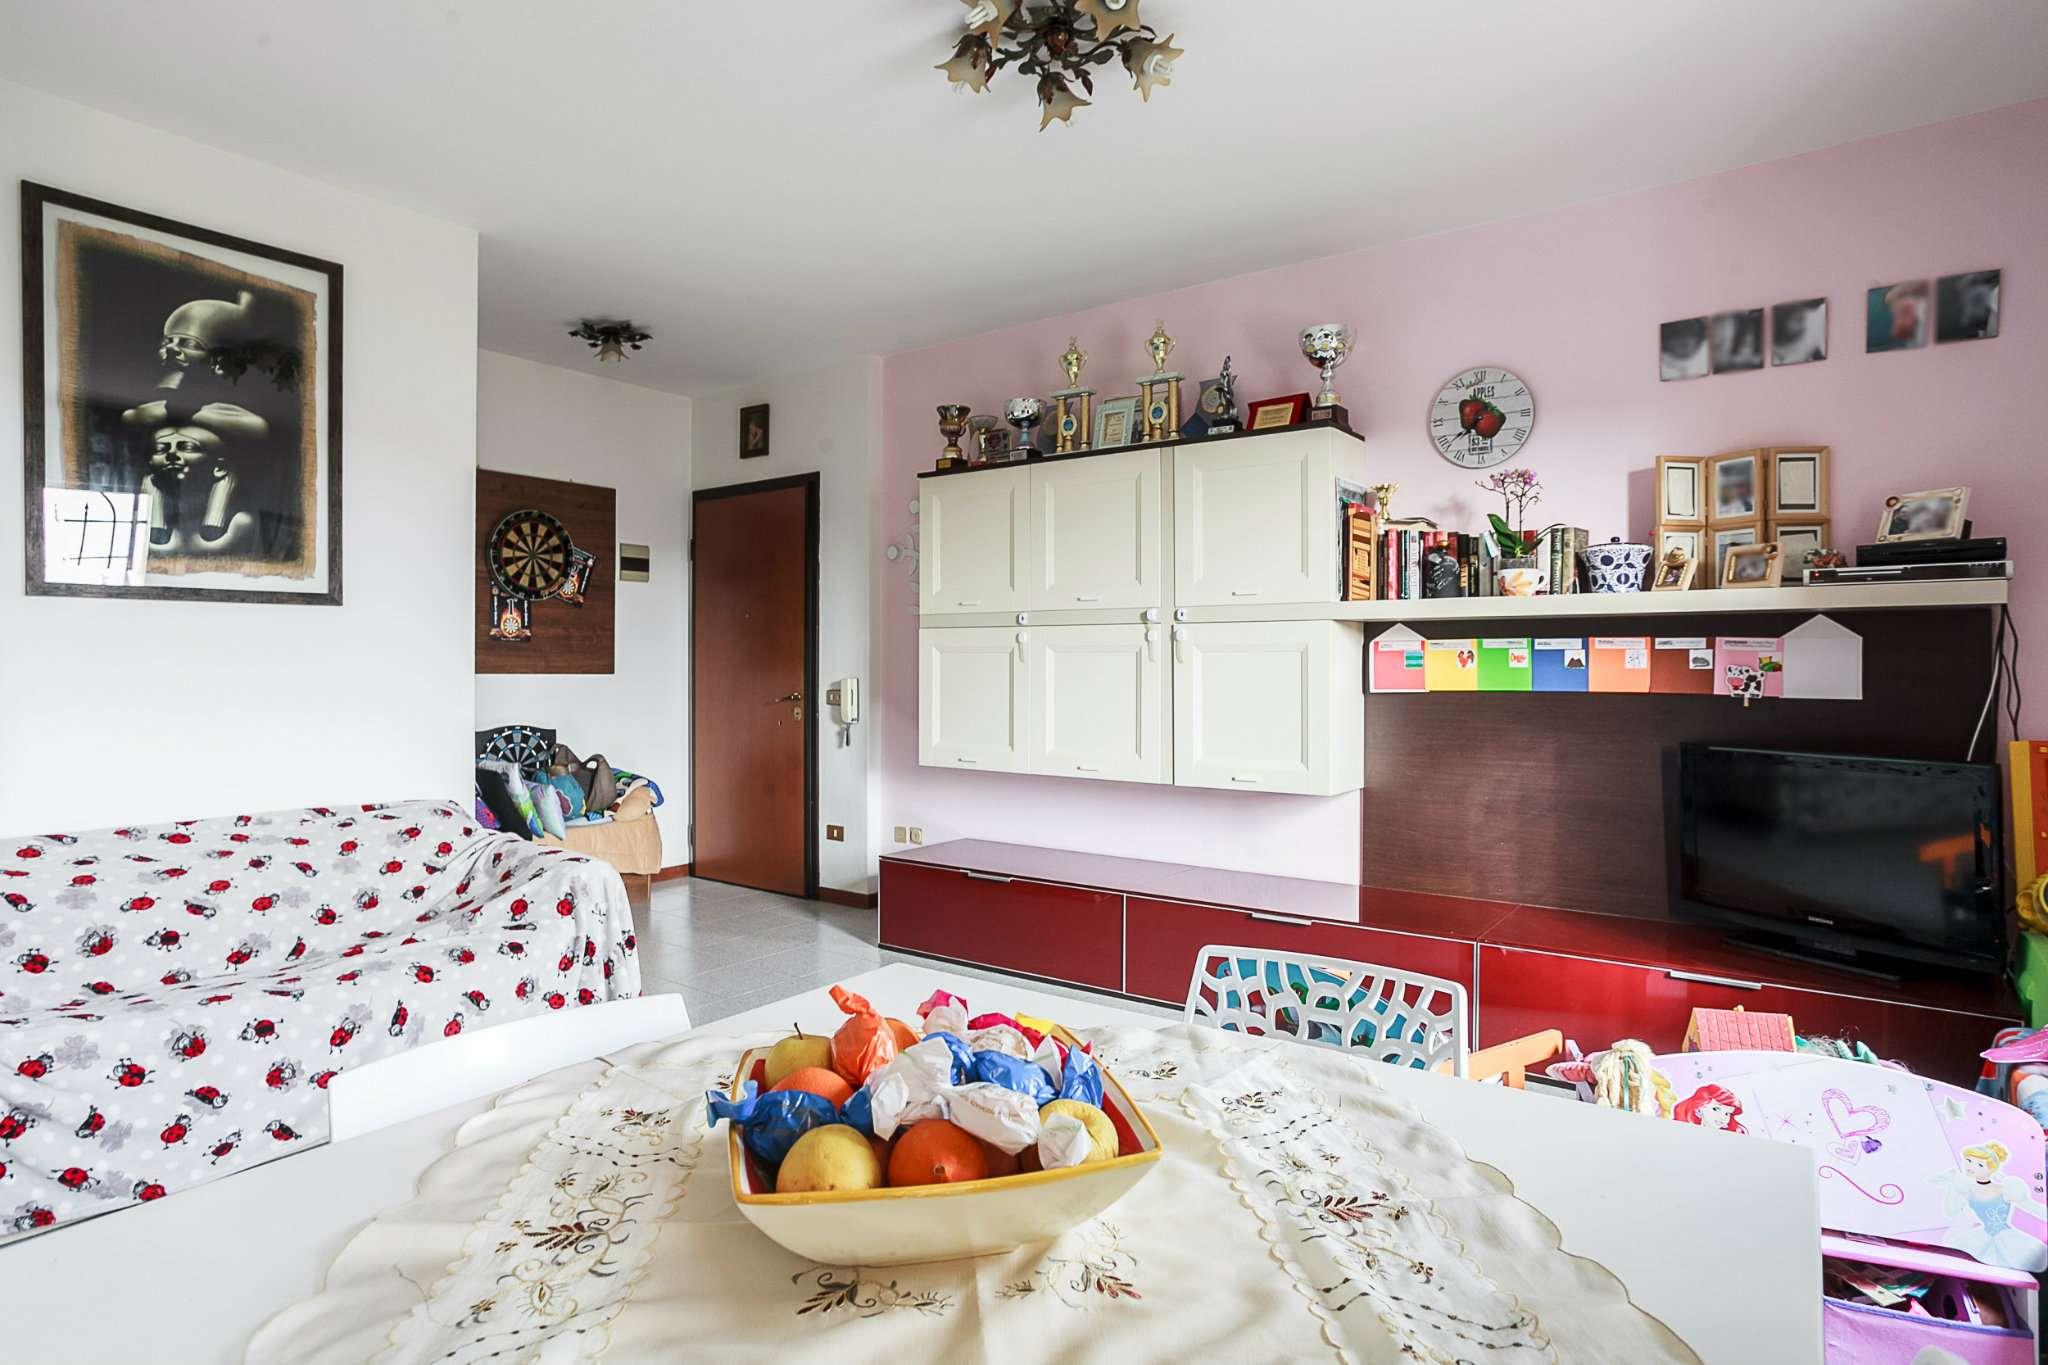 Appartamento, a moro, Vendita - Castello D'argile